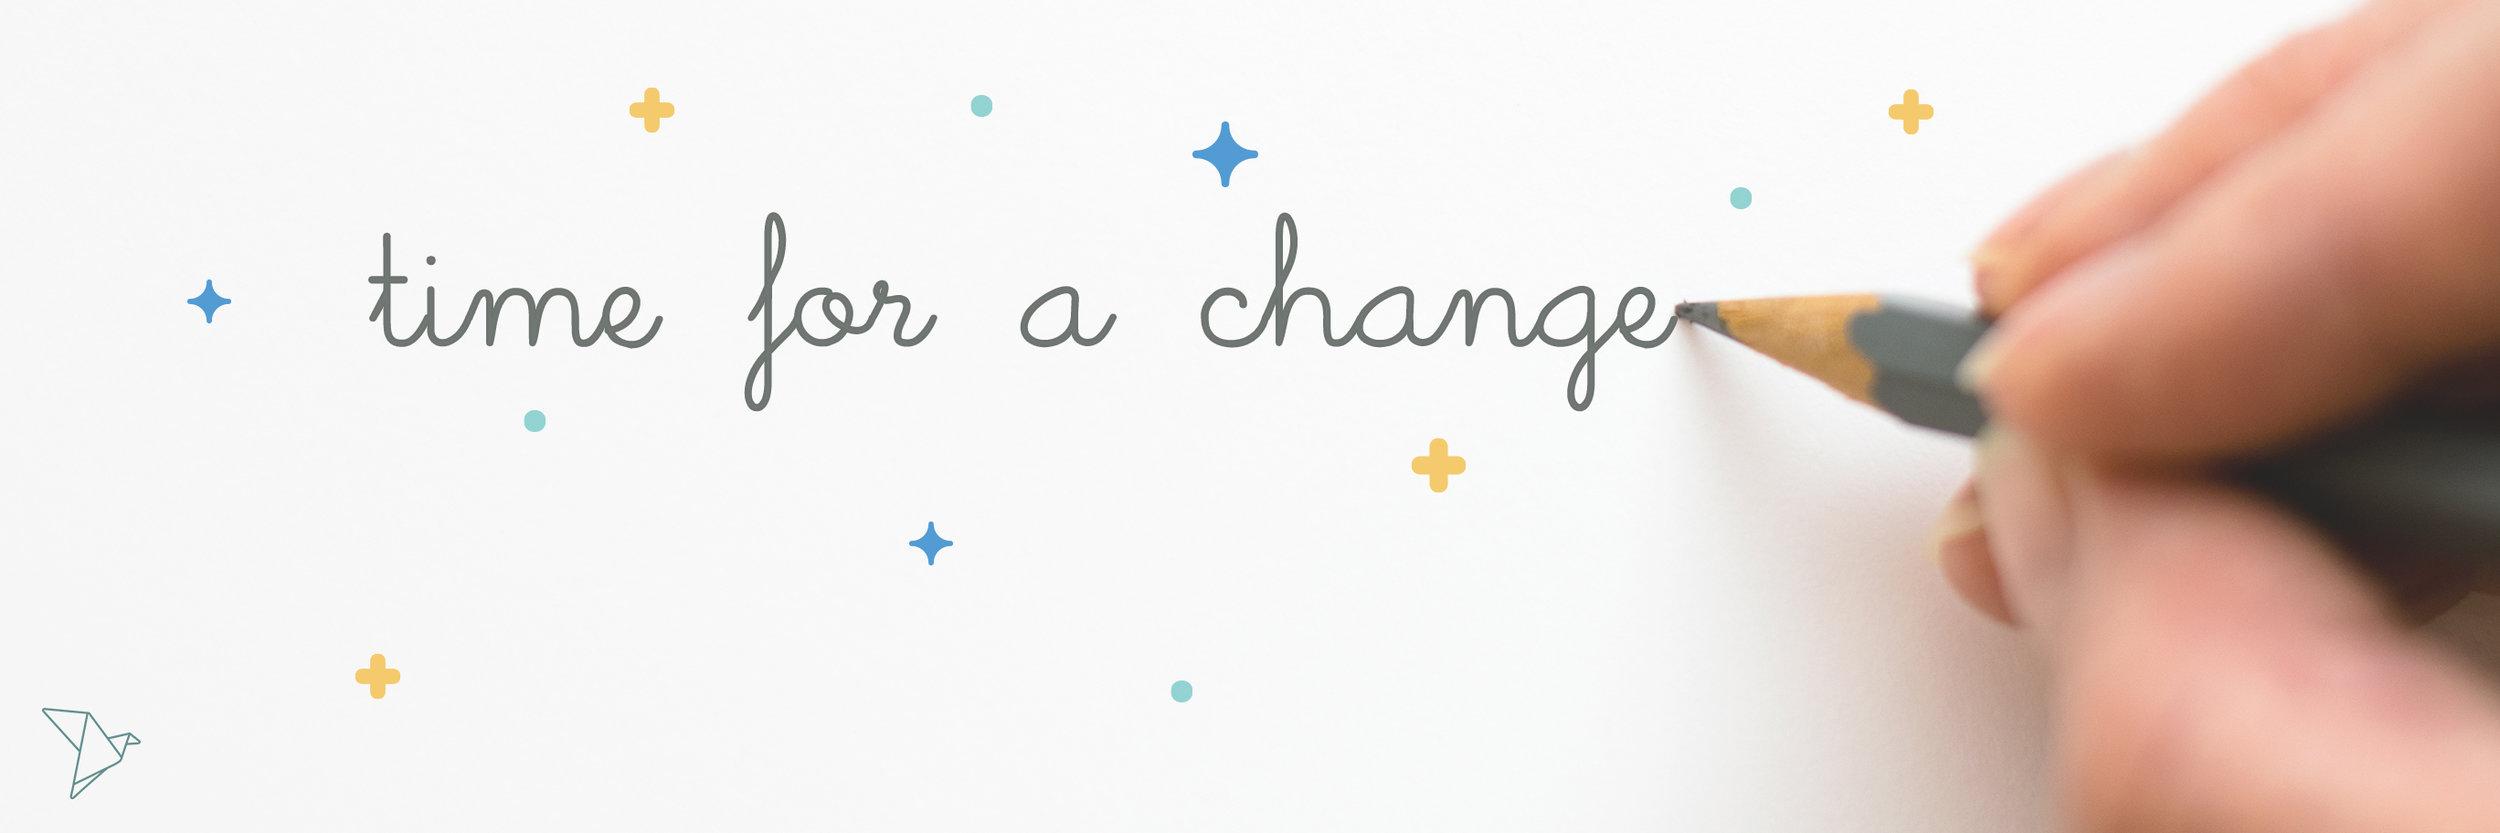 blog01-3-change.jpg